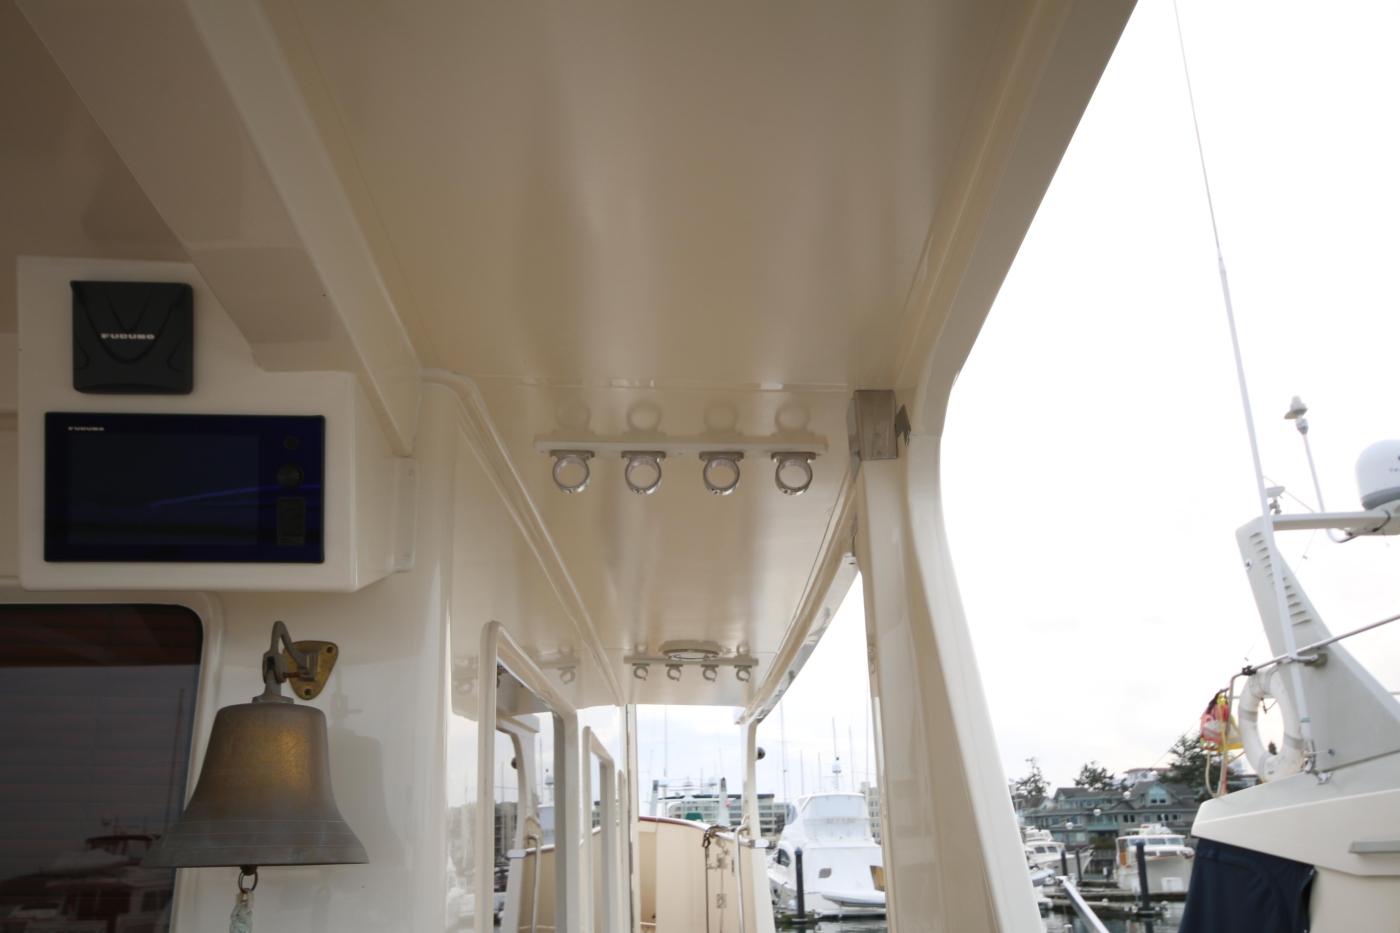 2015 Fleming 58 Pilothouse, Fishing rod holders